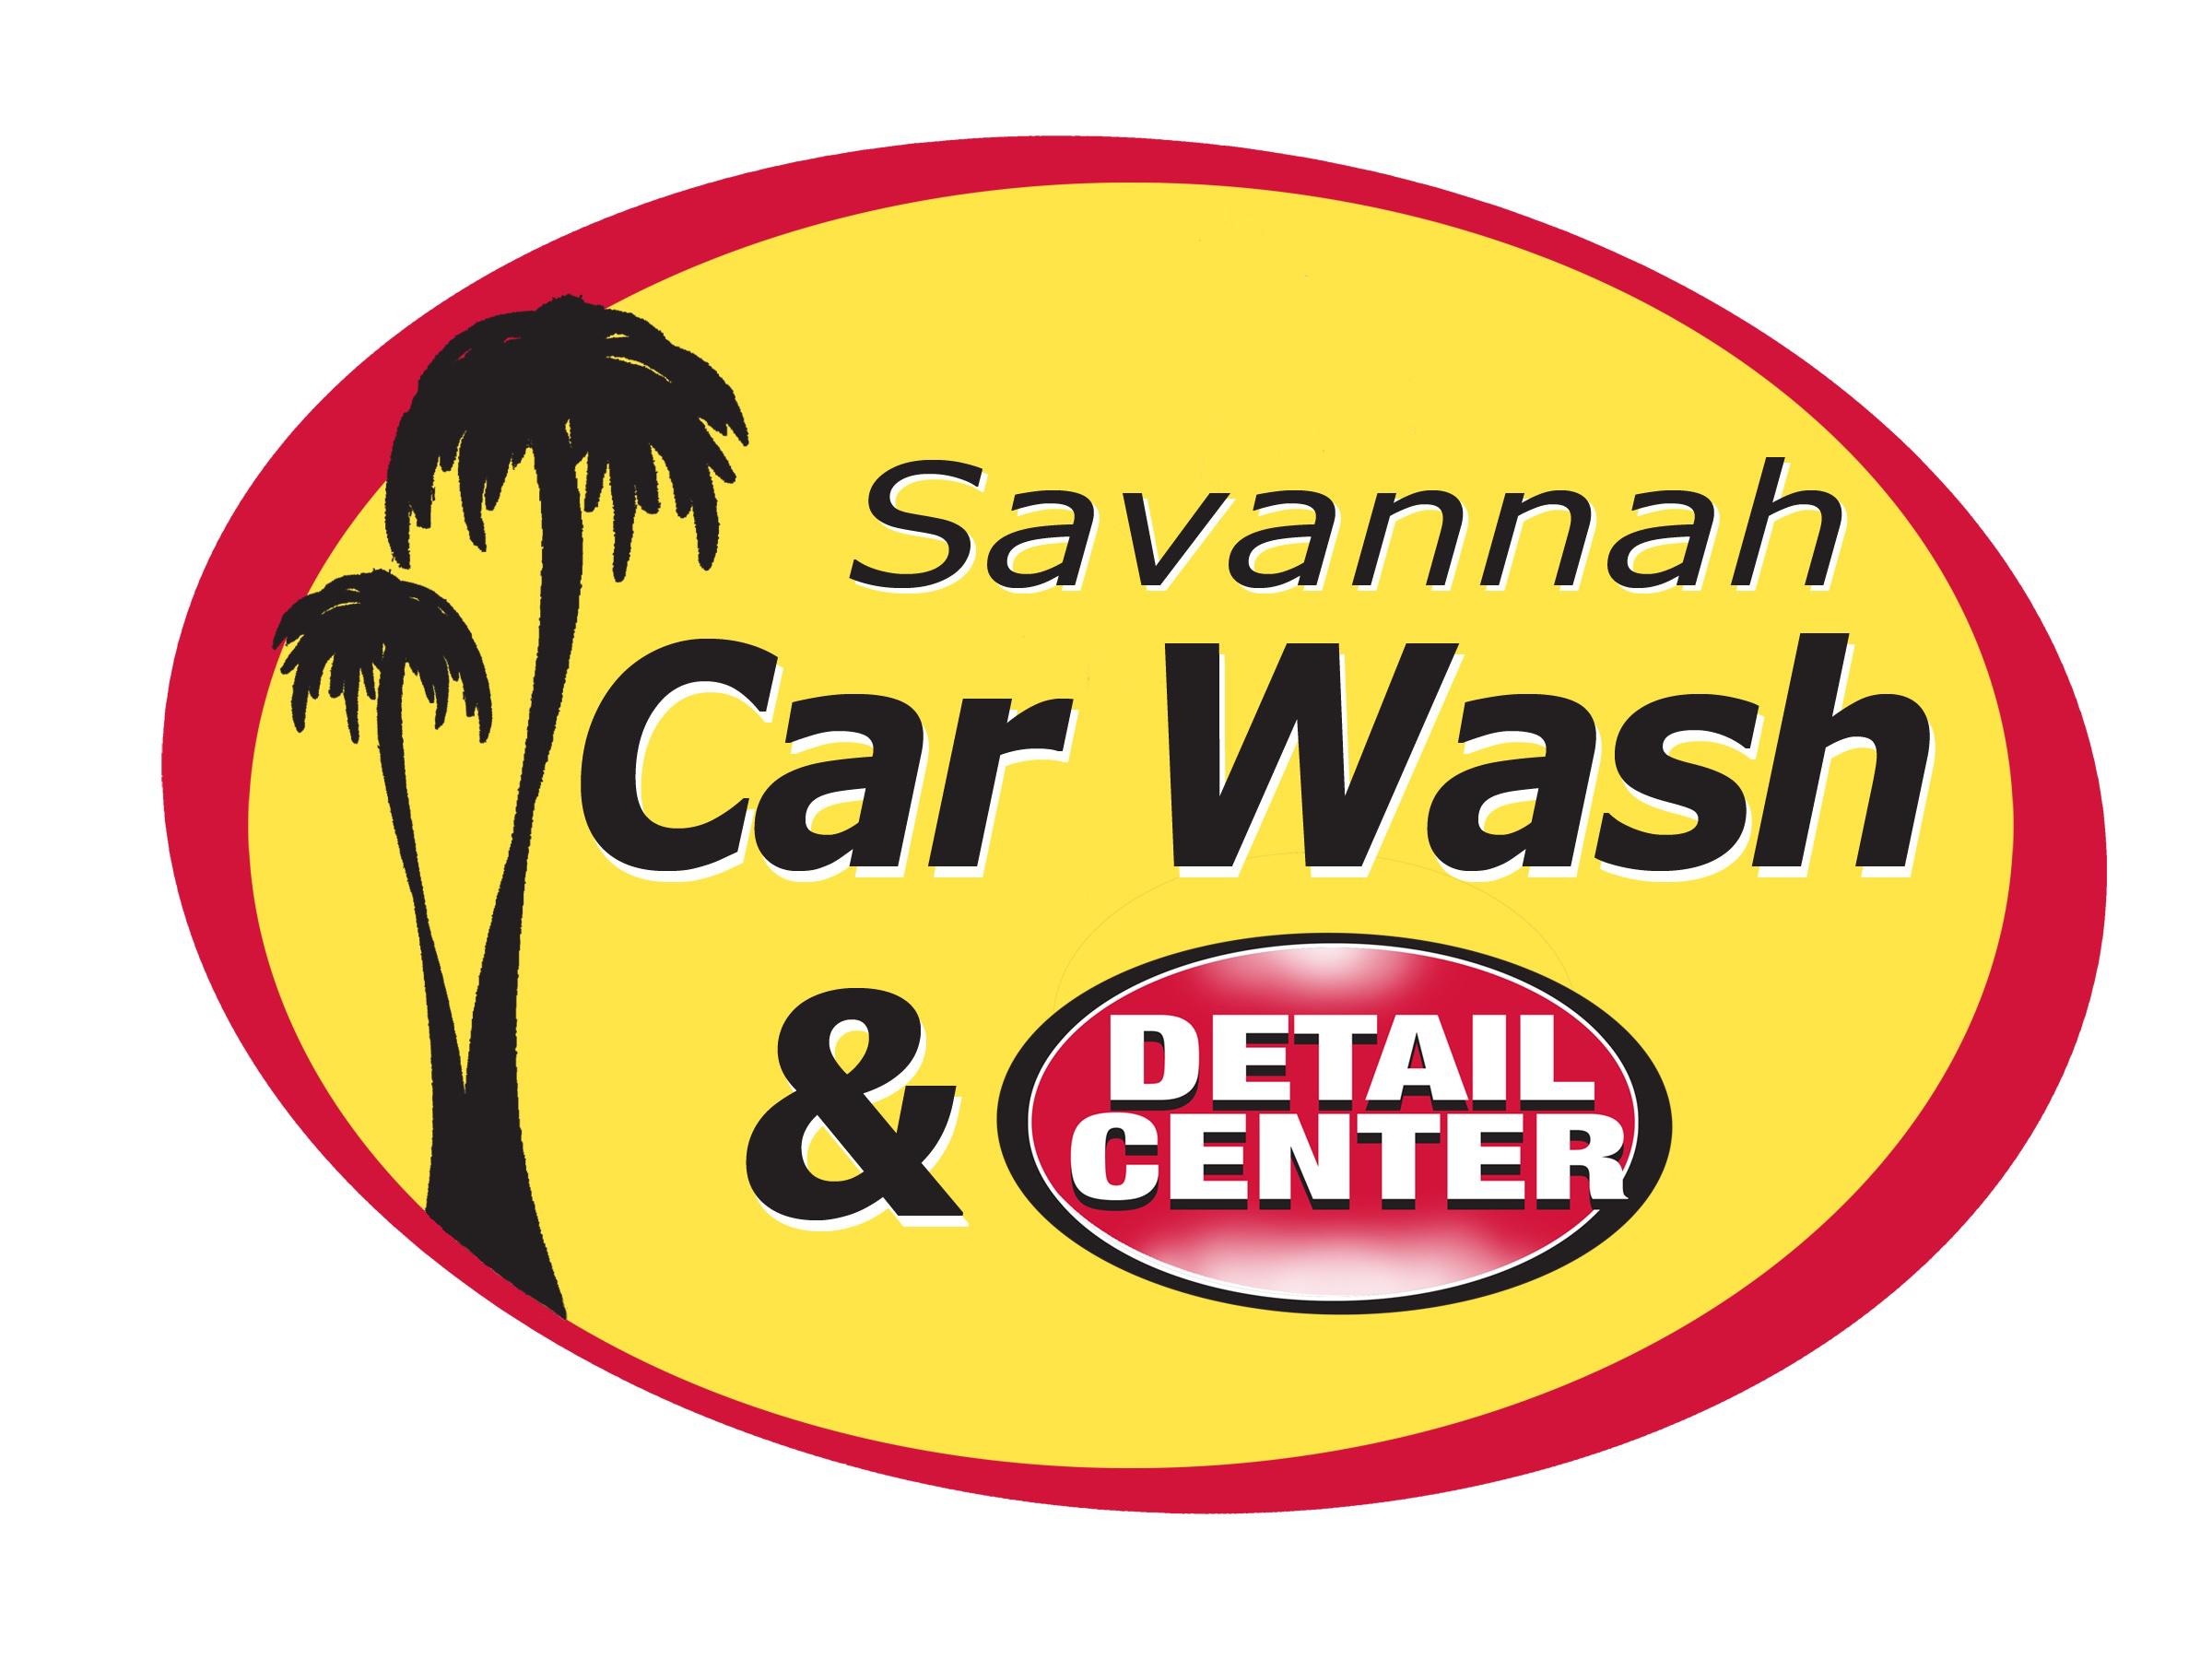 Car wash sponge clipart picture library Car Washes « Savannah Car Wash picture library